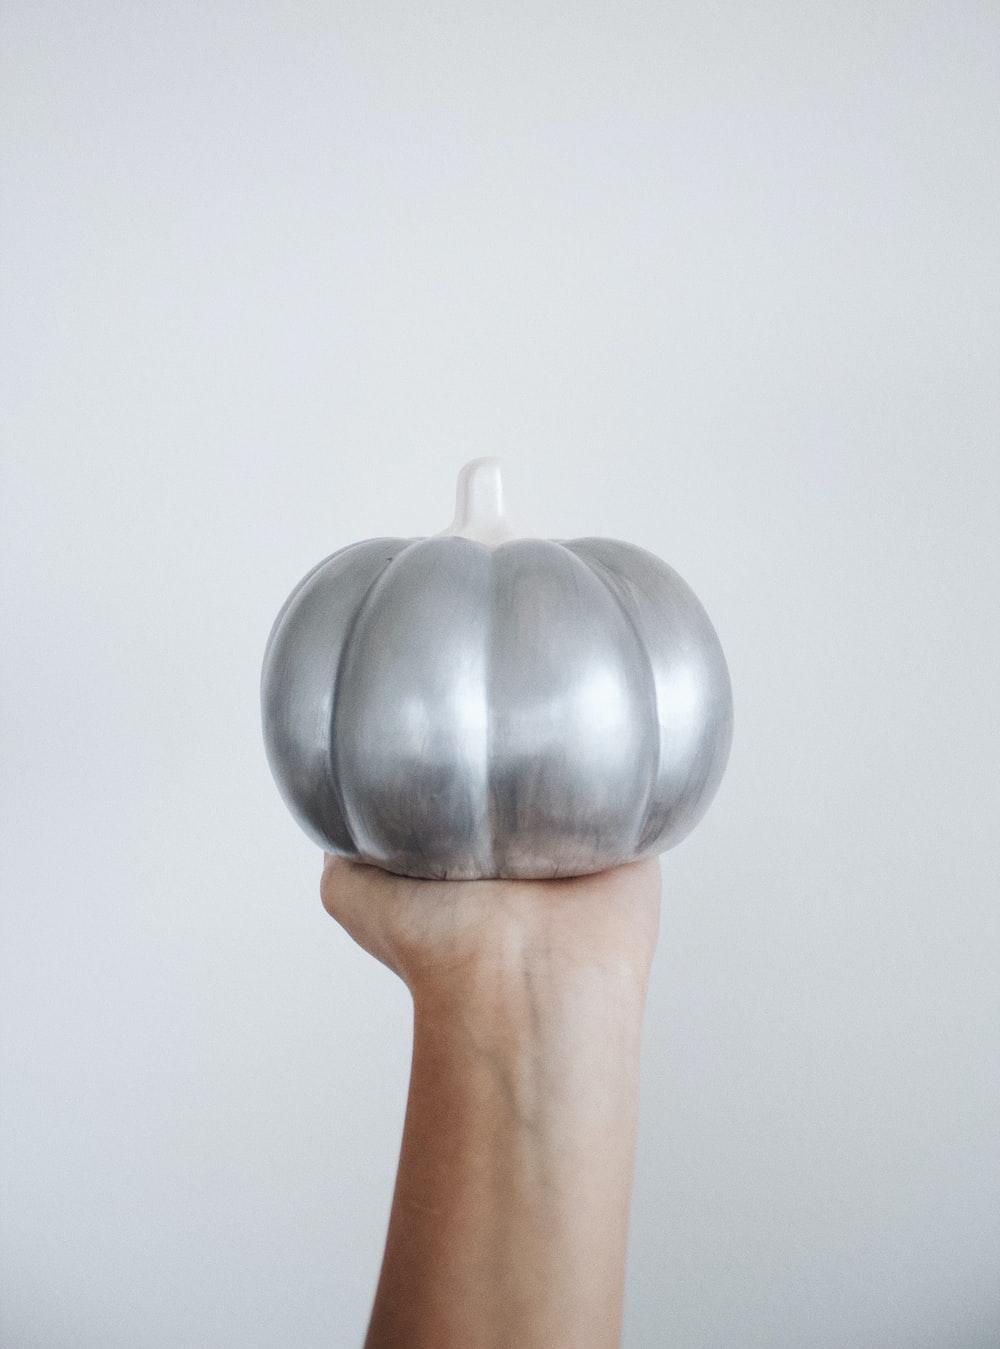 person holding silver round ornament